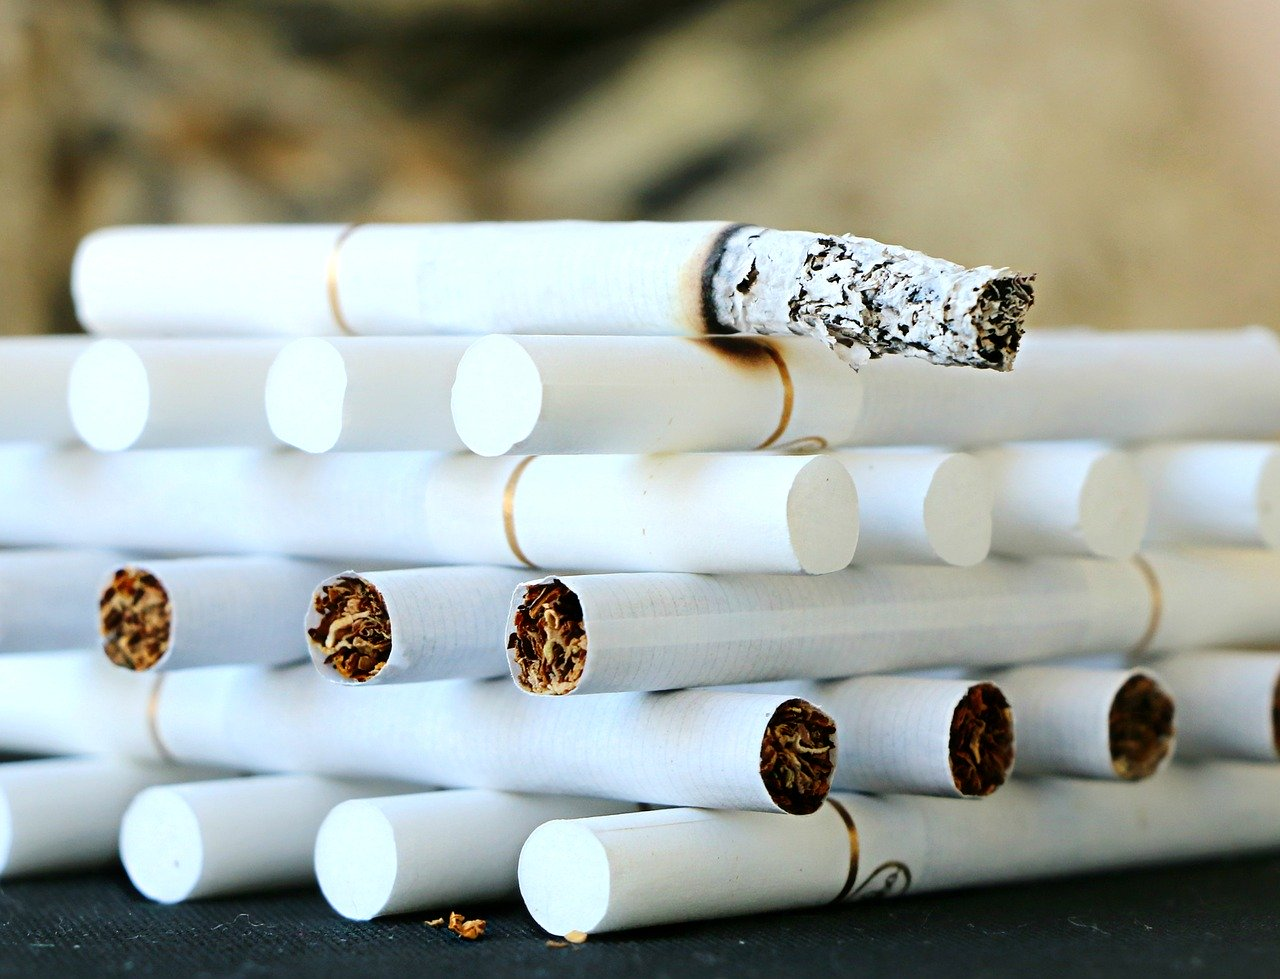 Tabakkonsum reduzieren